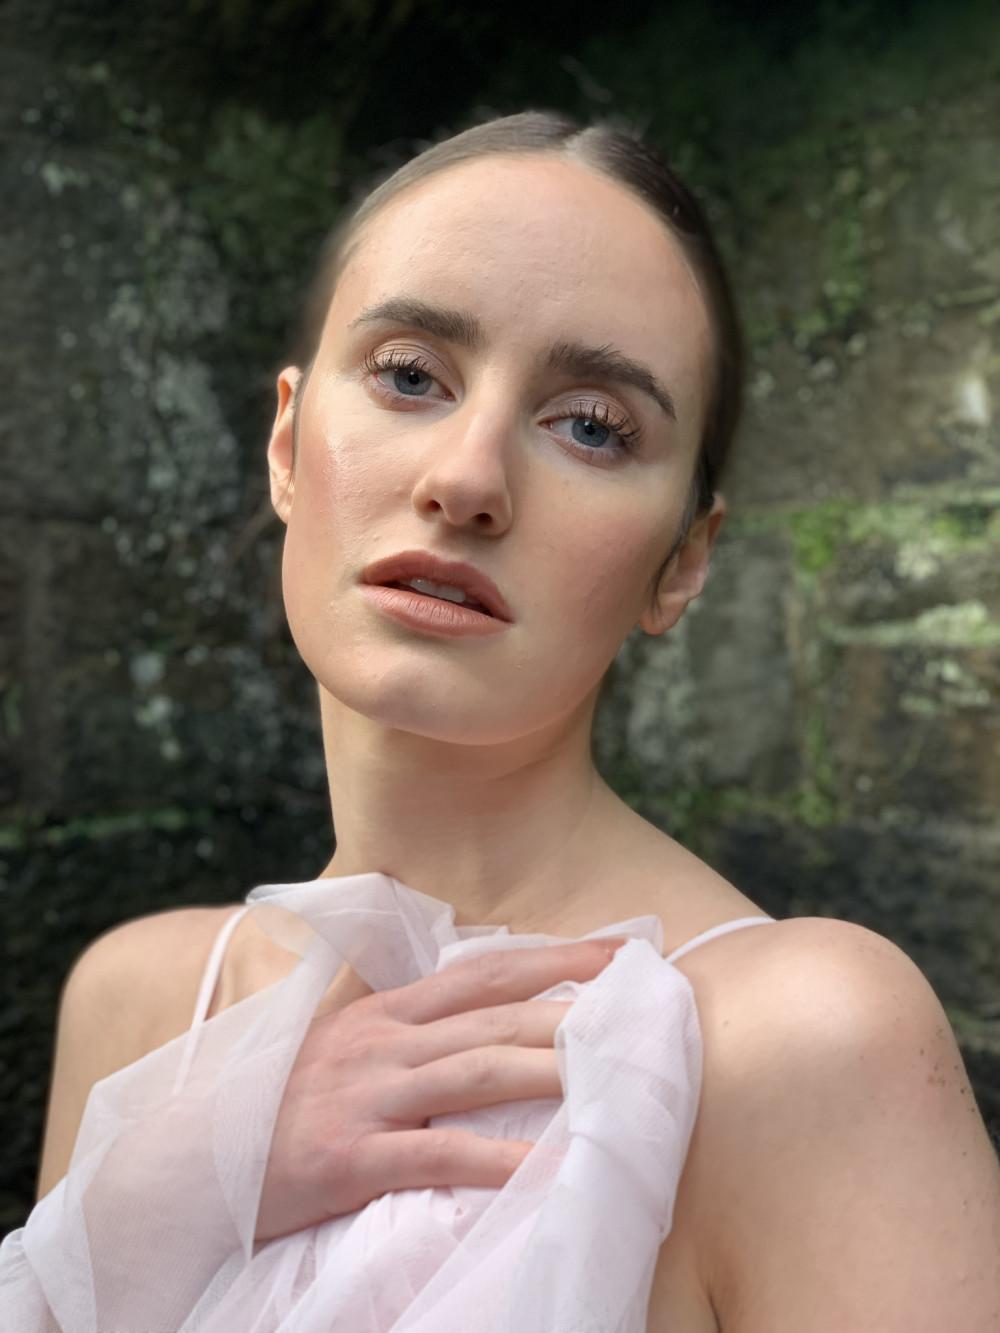 Natural skin using cream based products from Glossier - Make Me Bridal Artist: Brows + Brides. #naturalmakeup #editorial